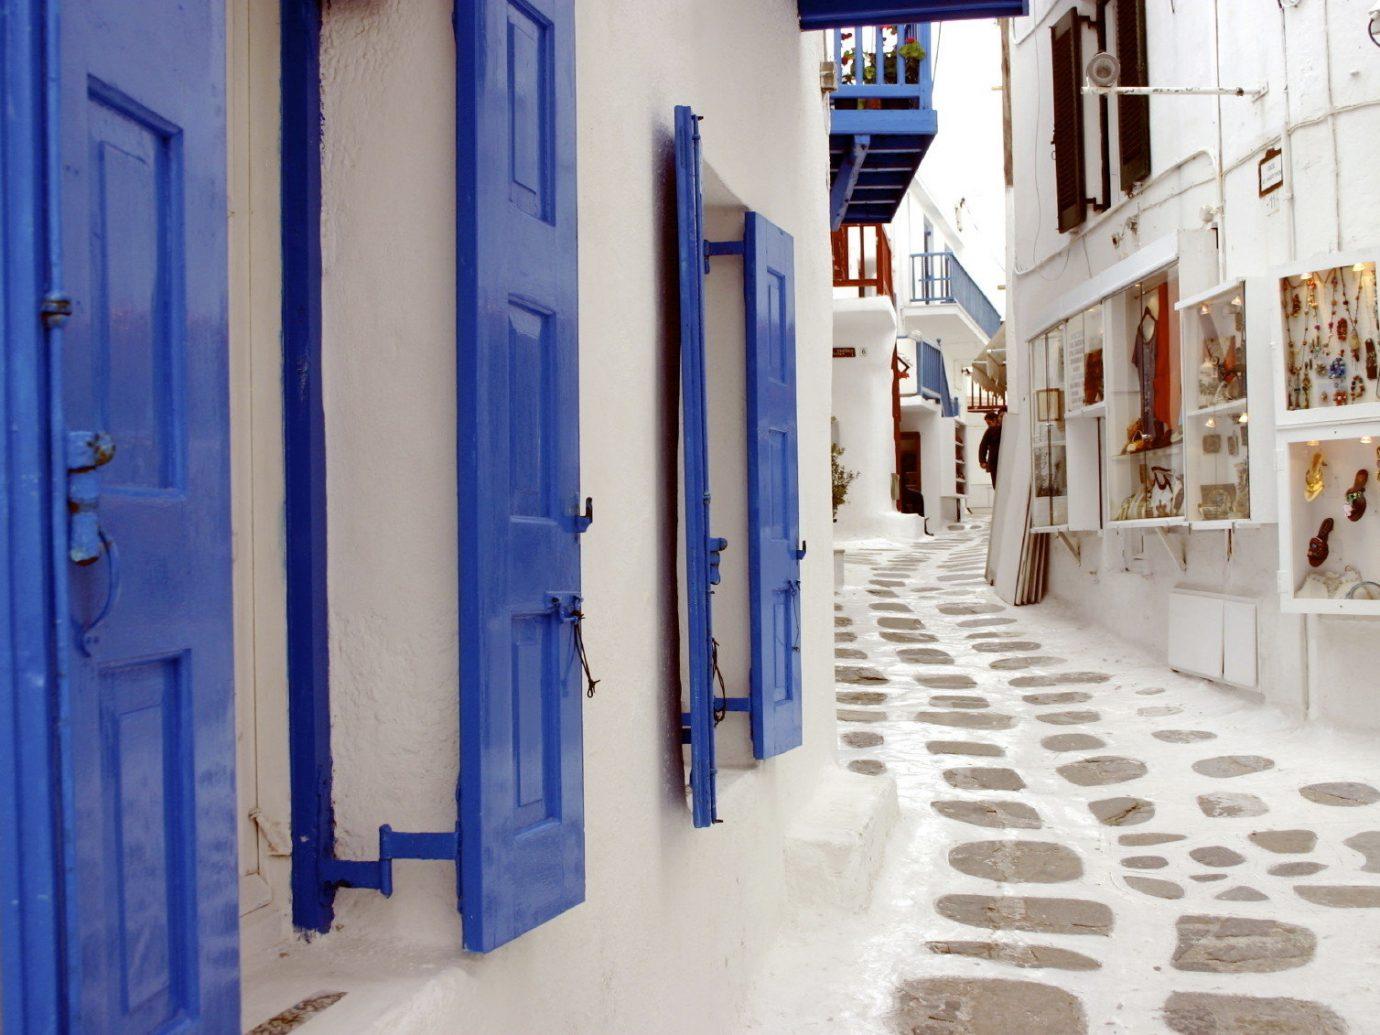 Romance Trip Ideas color indoor blue wall Architecture street art interior design facade hall